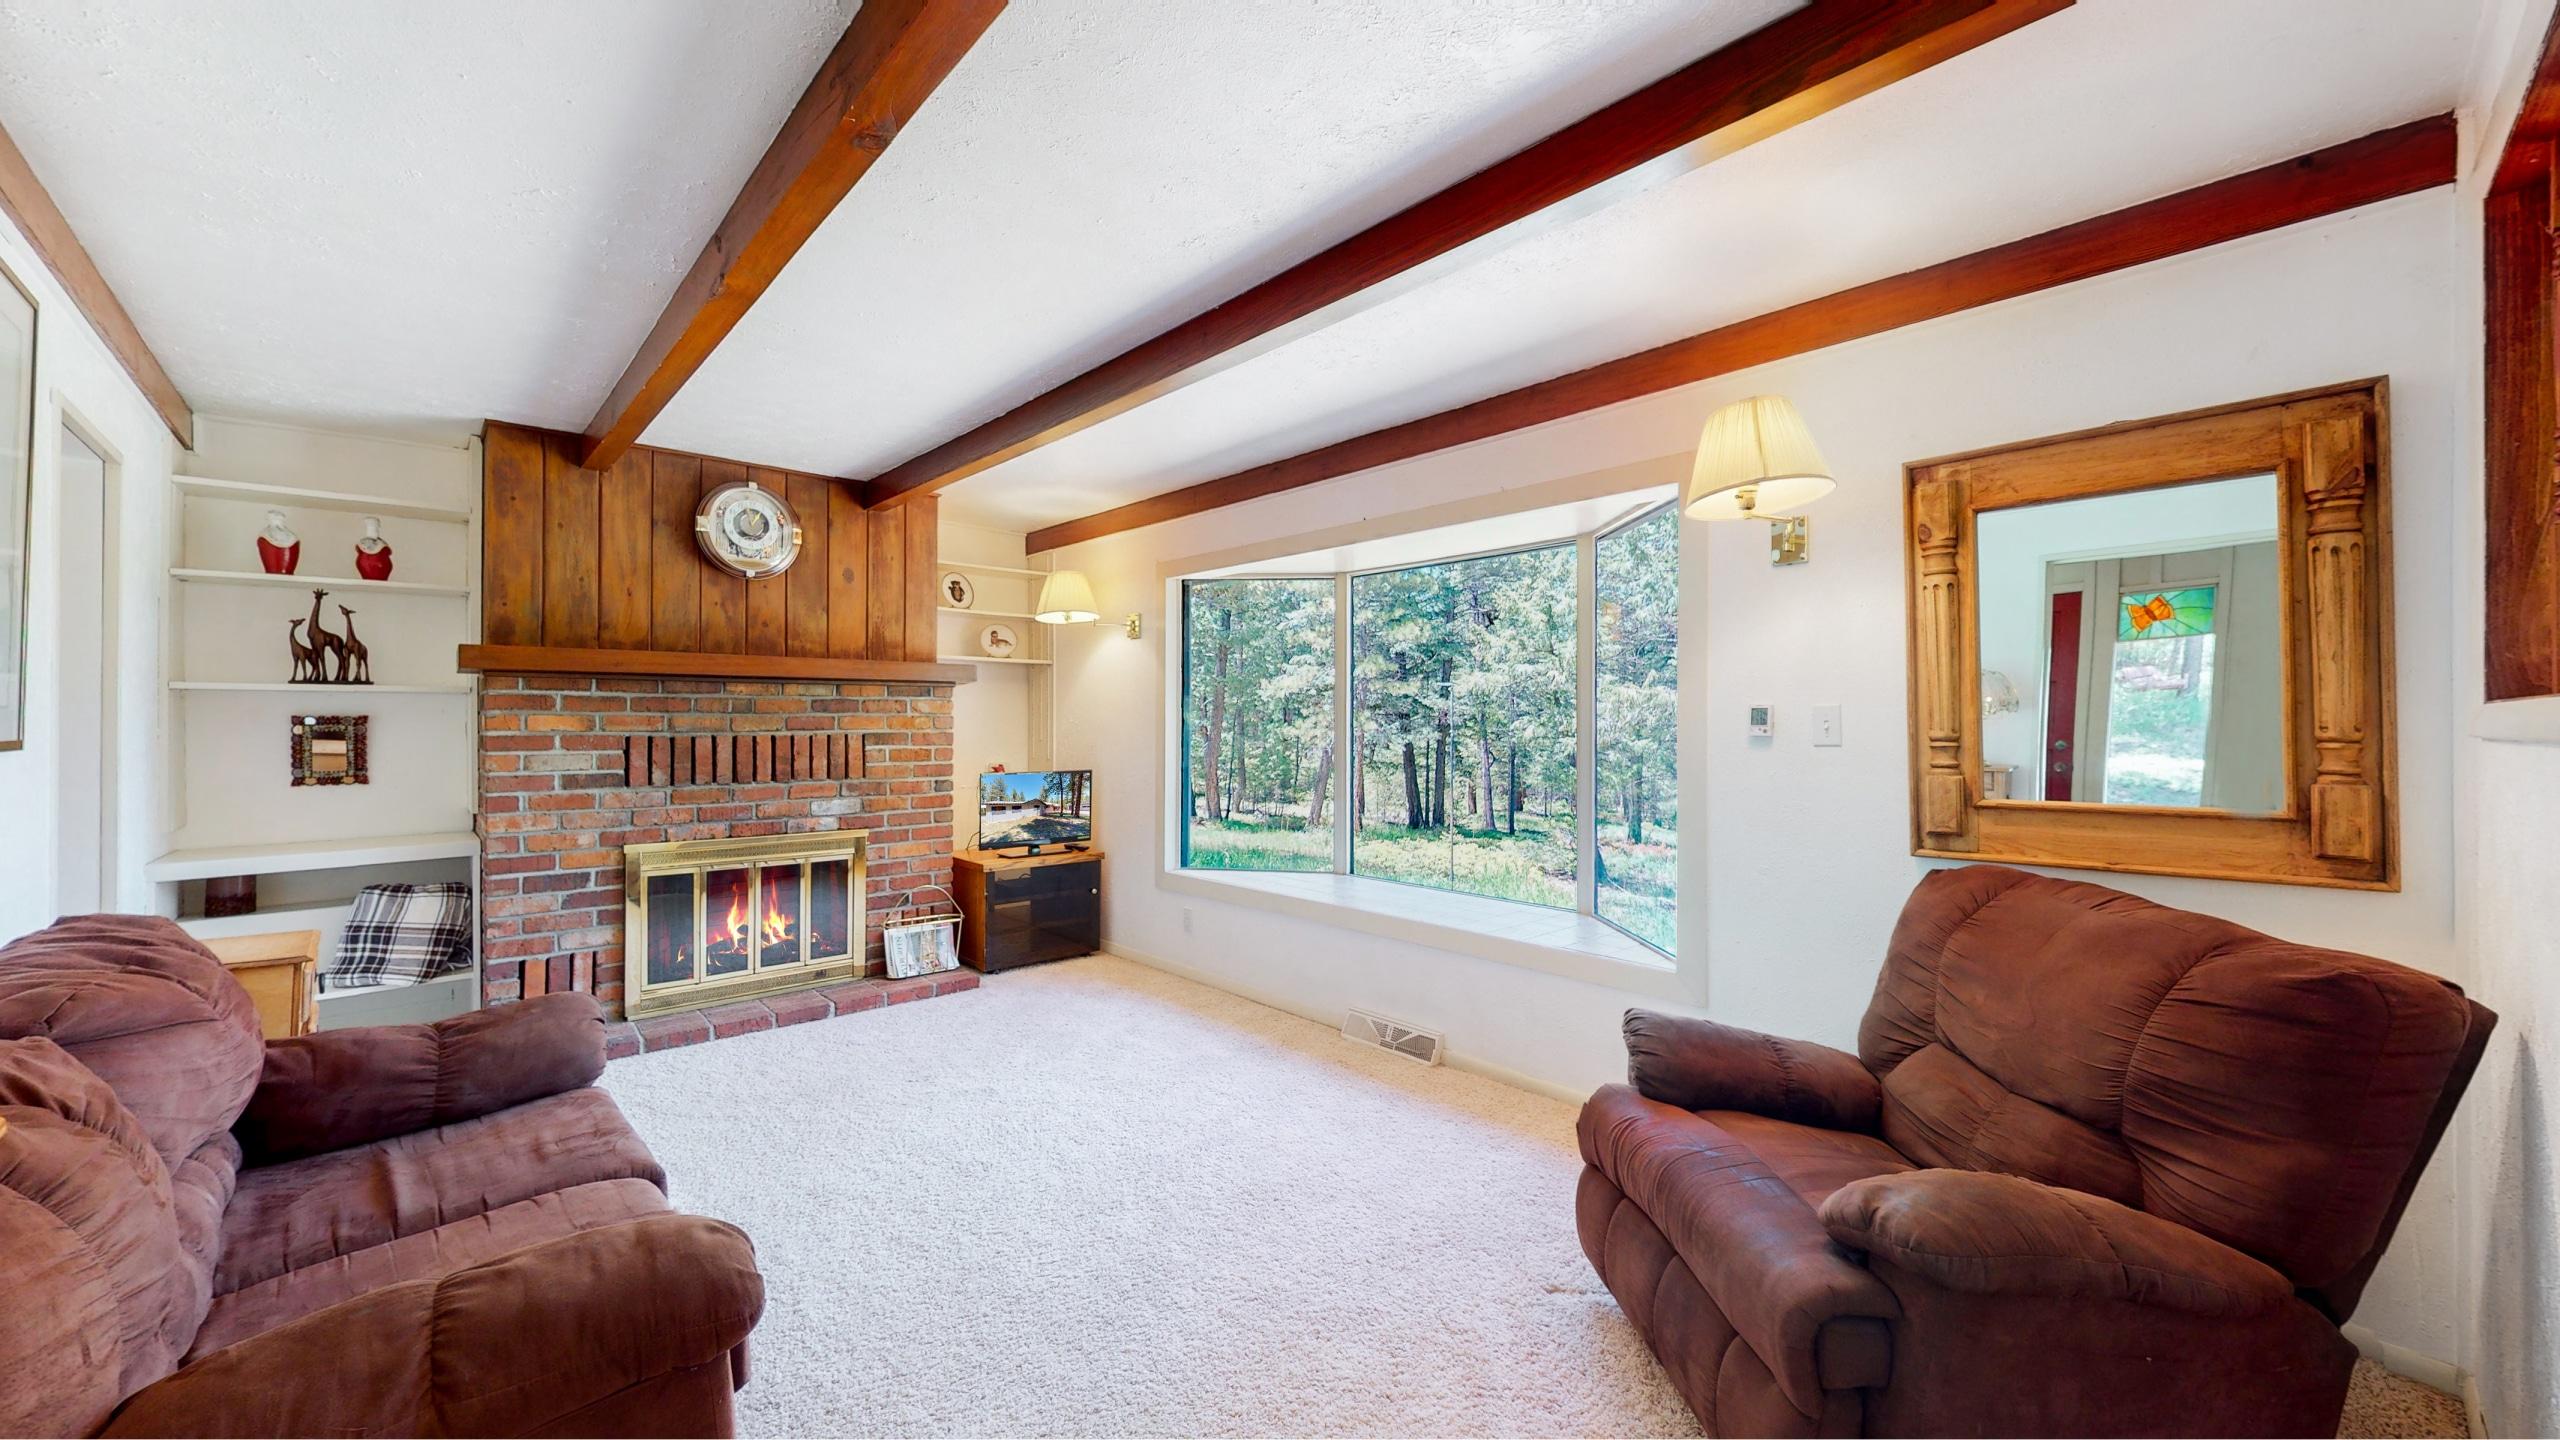 Living room with big bay windows and wood beams